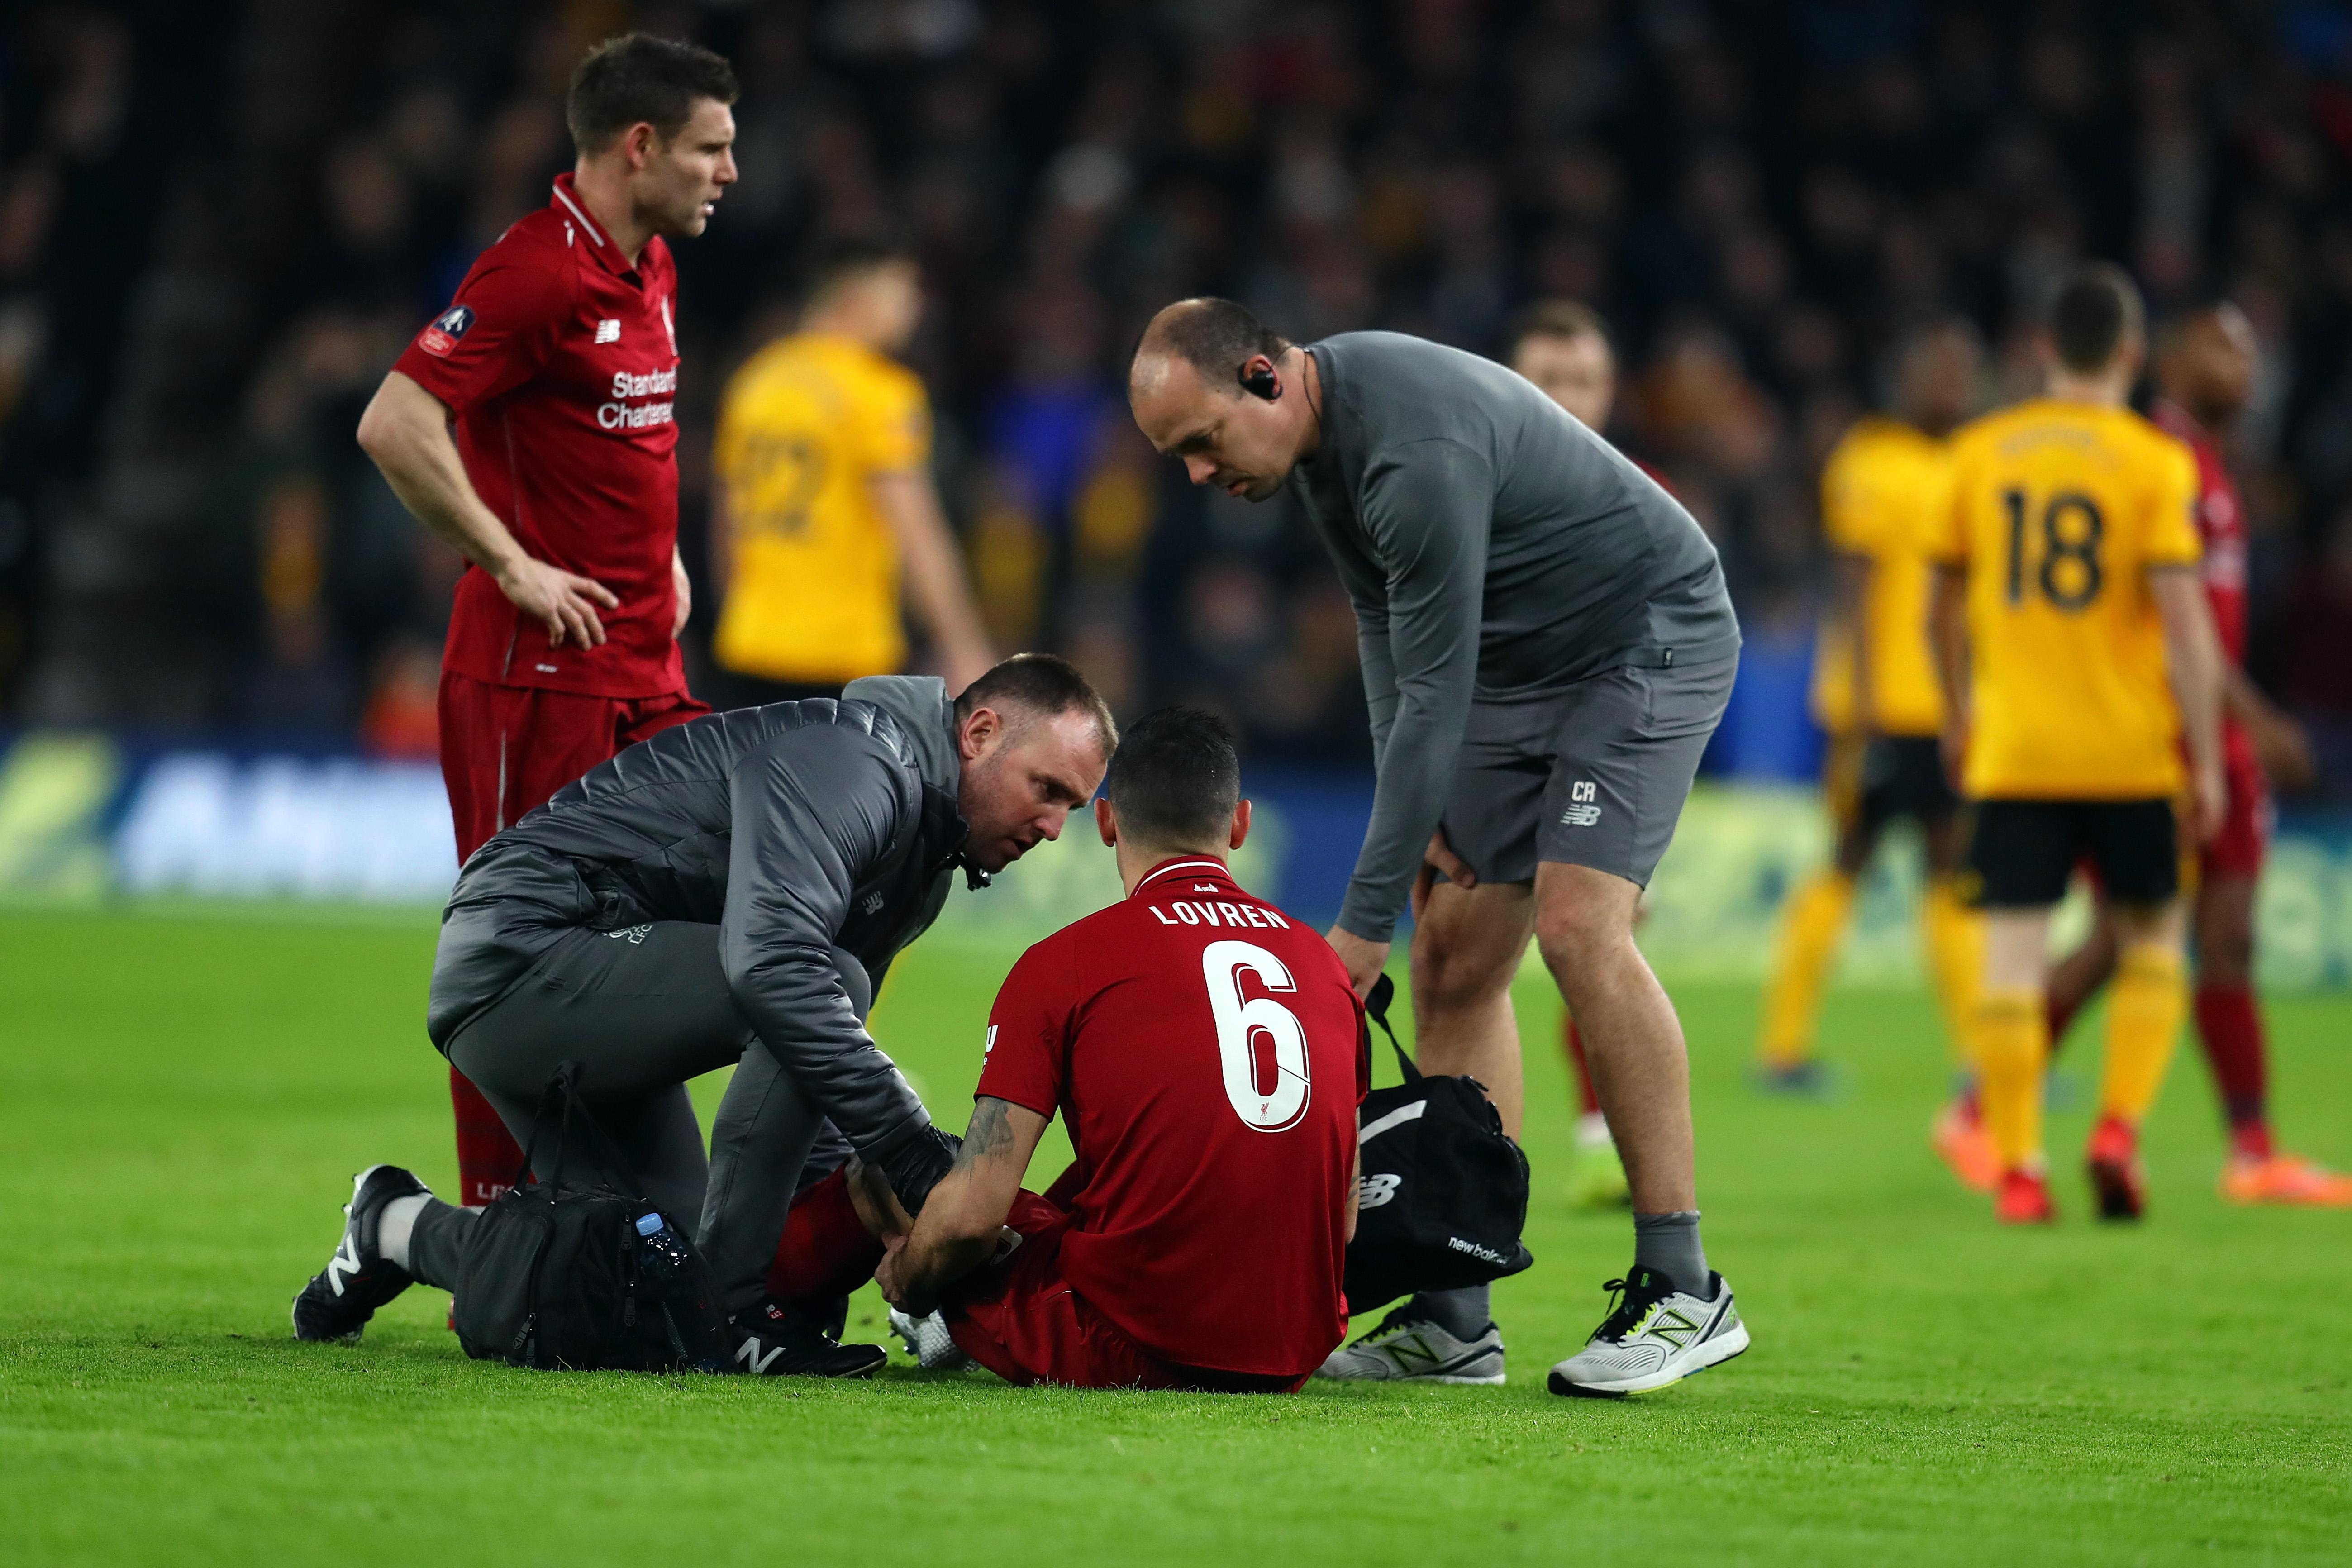 Dejan Lovren Likely to Miss Bayern Munich Clash Due to Injury